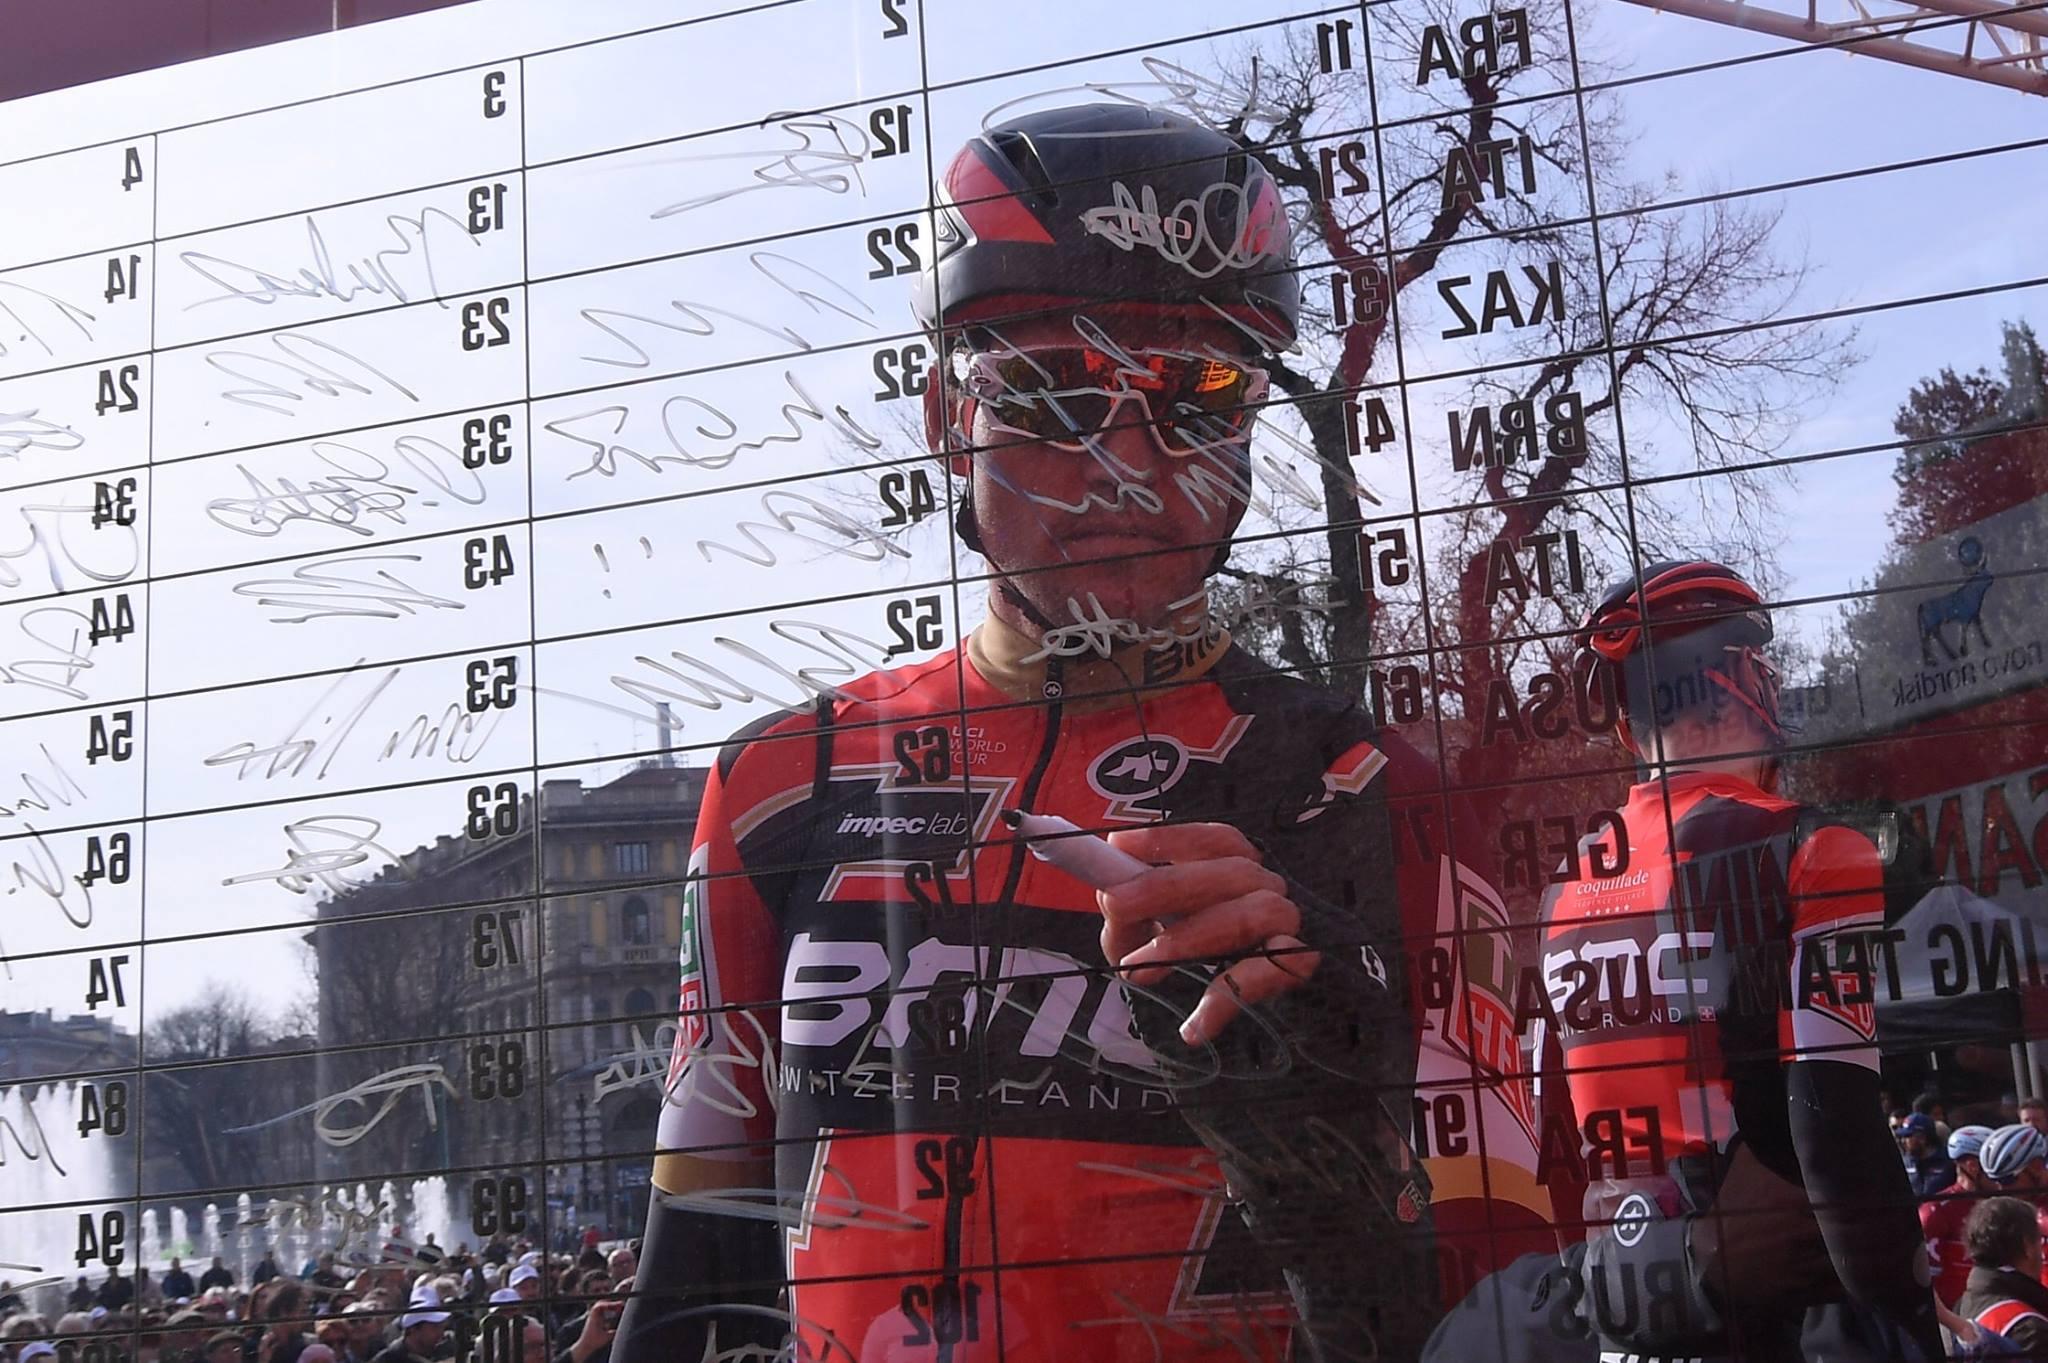 Milán-San Remo Van Avermaet JoanSeguidor